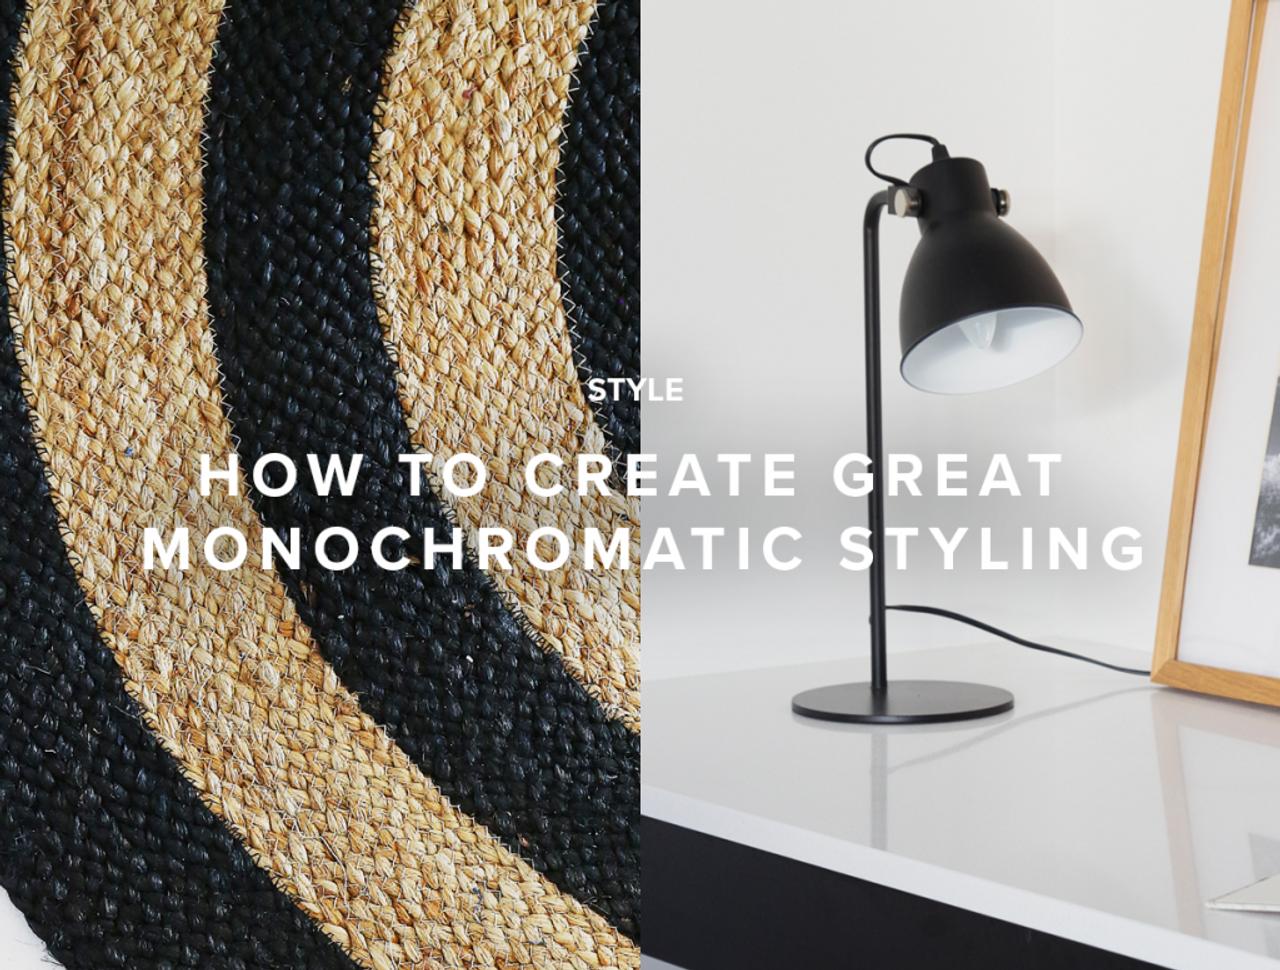 How to Acheieve Great Monochrome Styling